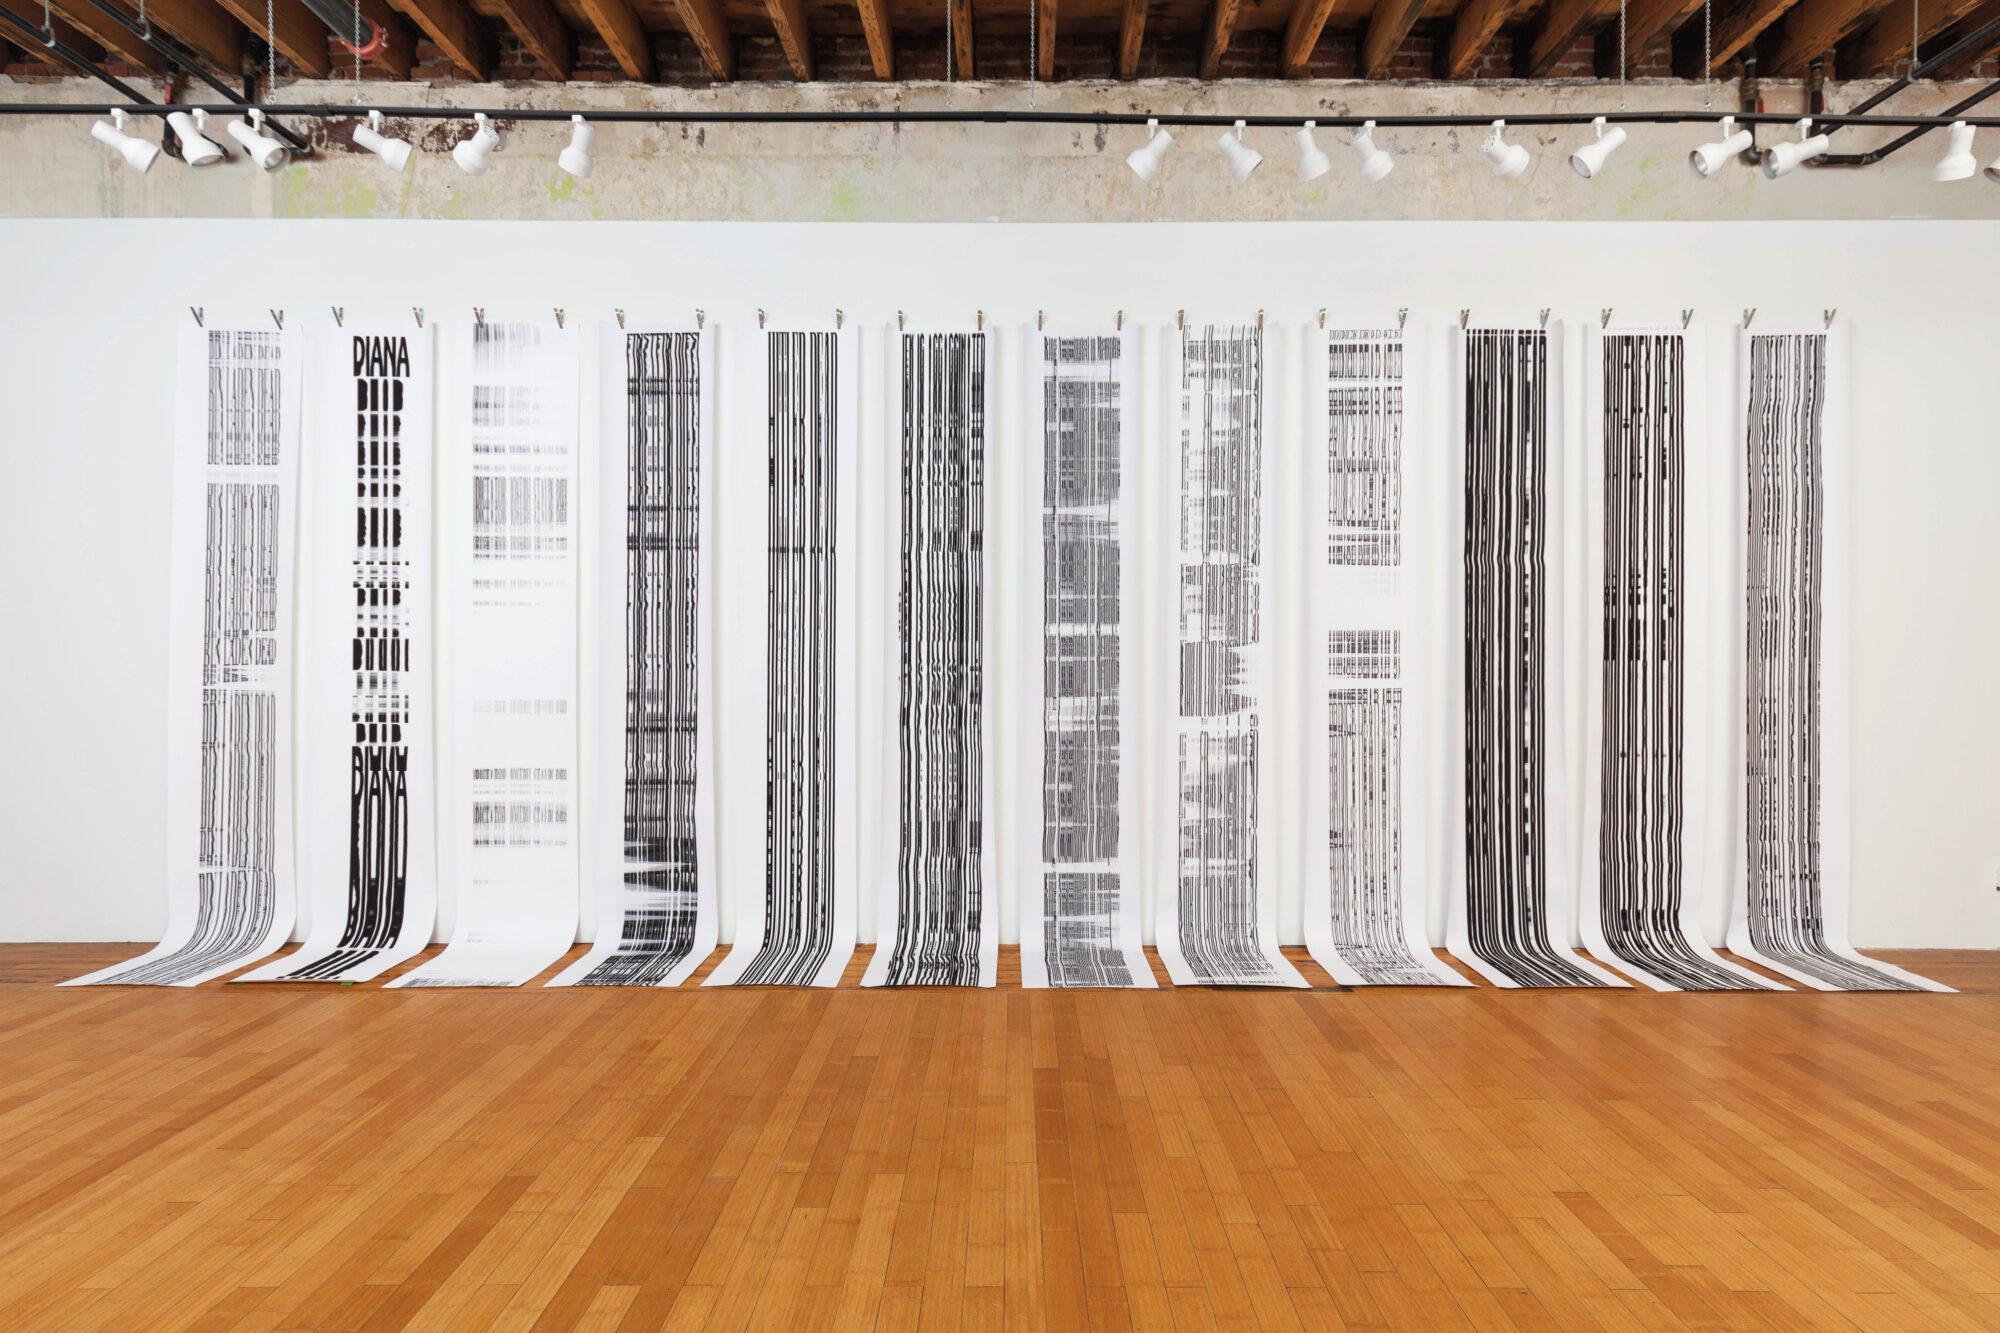 strips of artwork hanging on walls